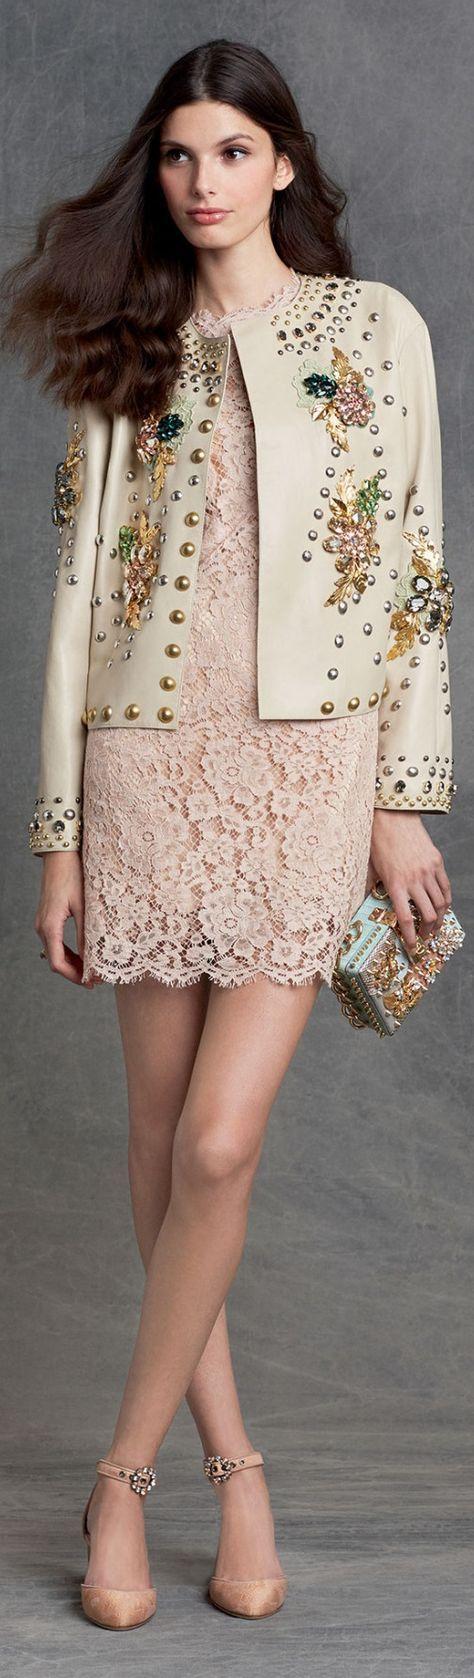 Boho tunic top blouses and dress 4009 trendy boho vintage gypsy - Dolce Gabbana Fall Winter 2016